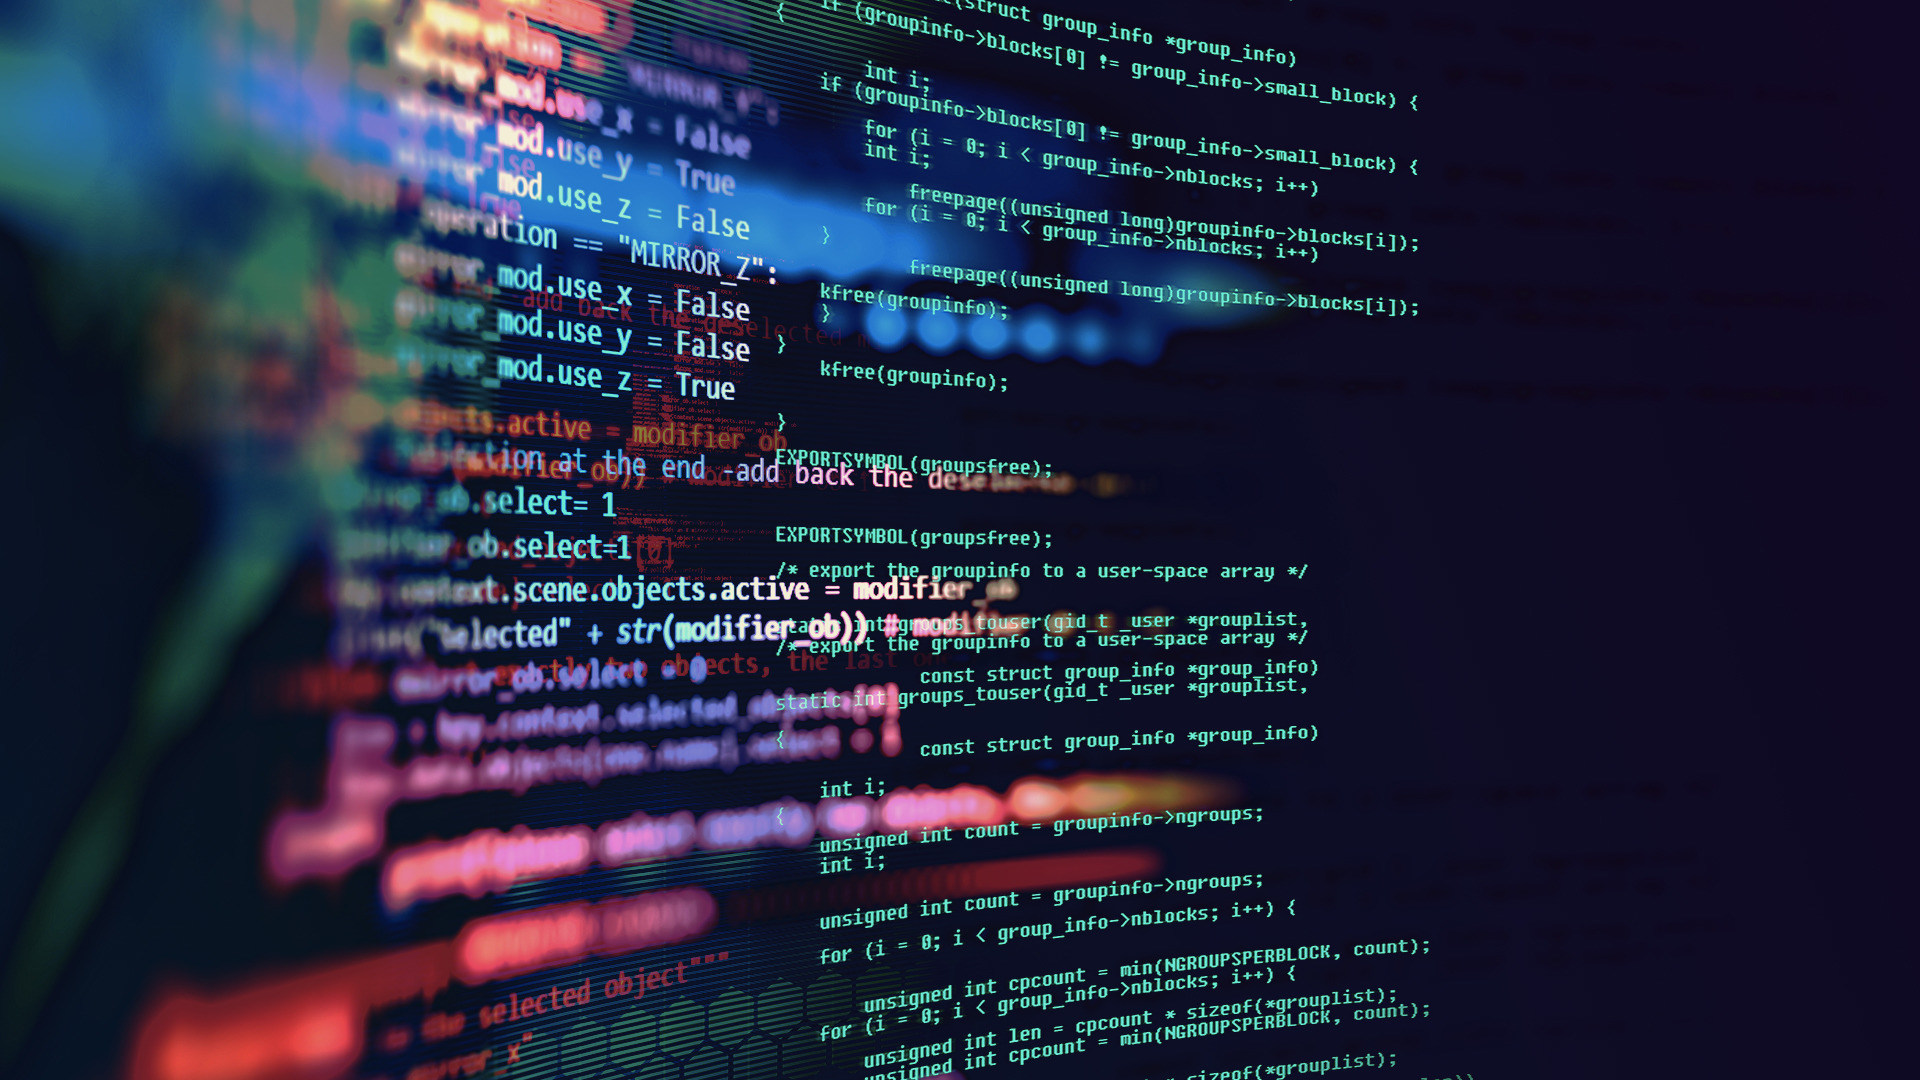 Hacker, Security, Hack, Entwickler, Entwicklung, Exploit, Hacking, Cybersecurity, Code, Quellcode, Programmierung, Programmierer, Developer, Sdk, Programmieren, Cyber, Development, Dev, Sourcecode, Coder, Binärcode, Coding, Binär